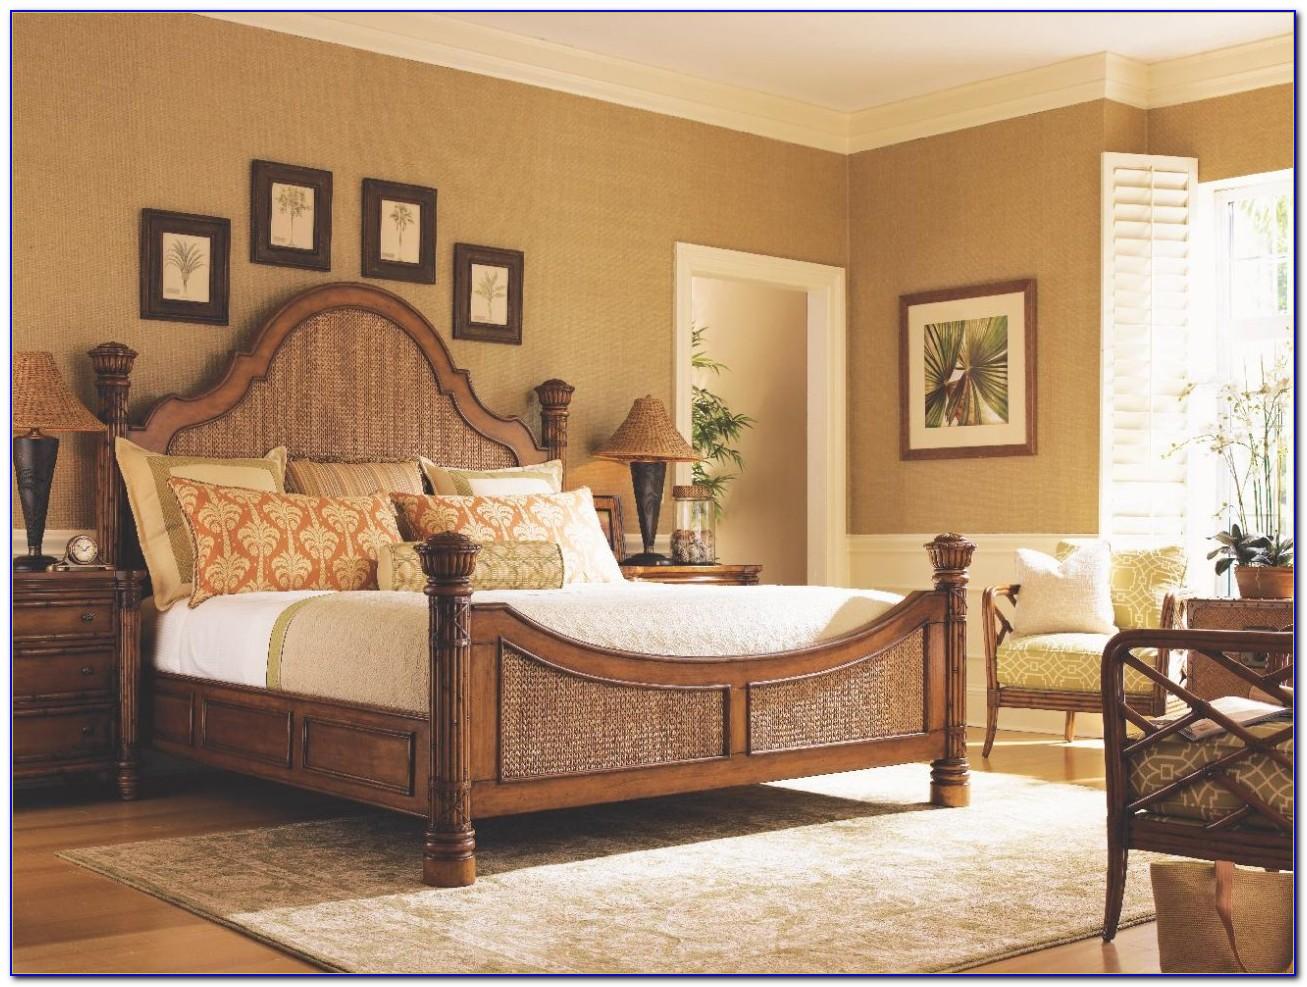 Tommy Bahama Bedroom Furniture Used